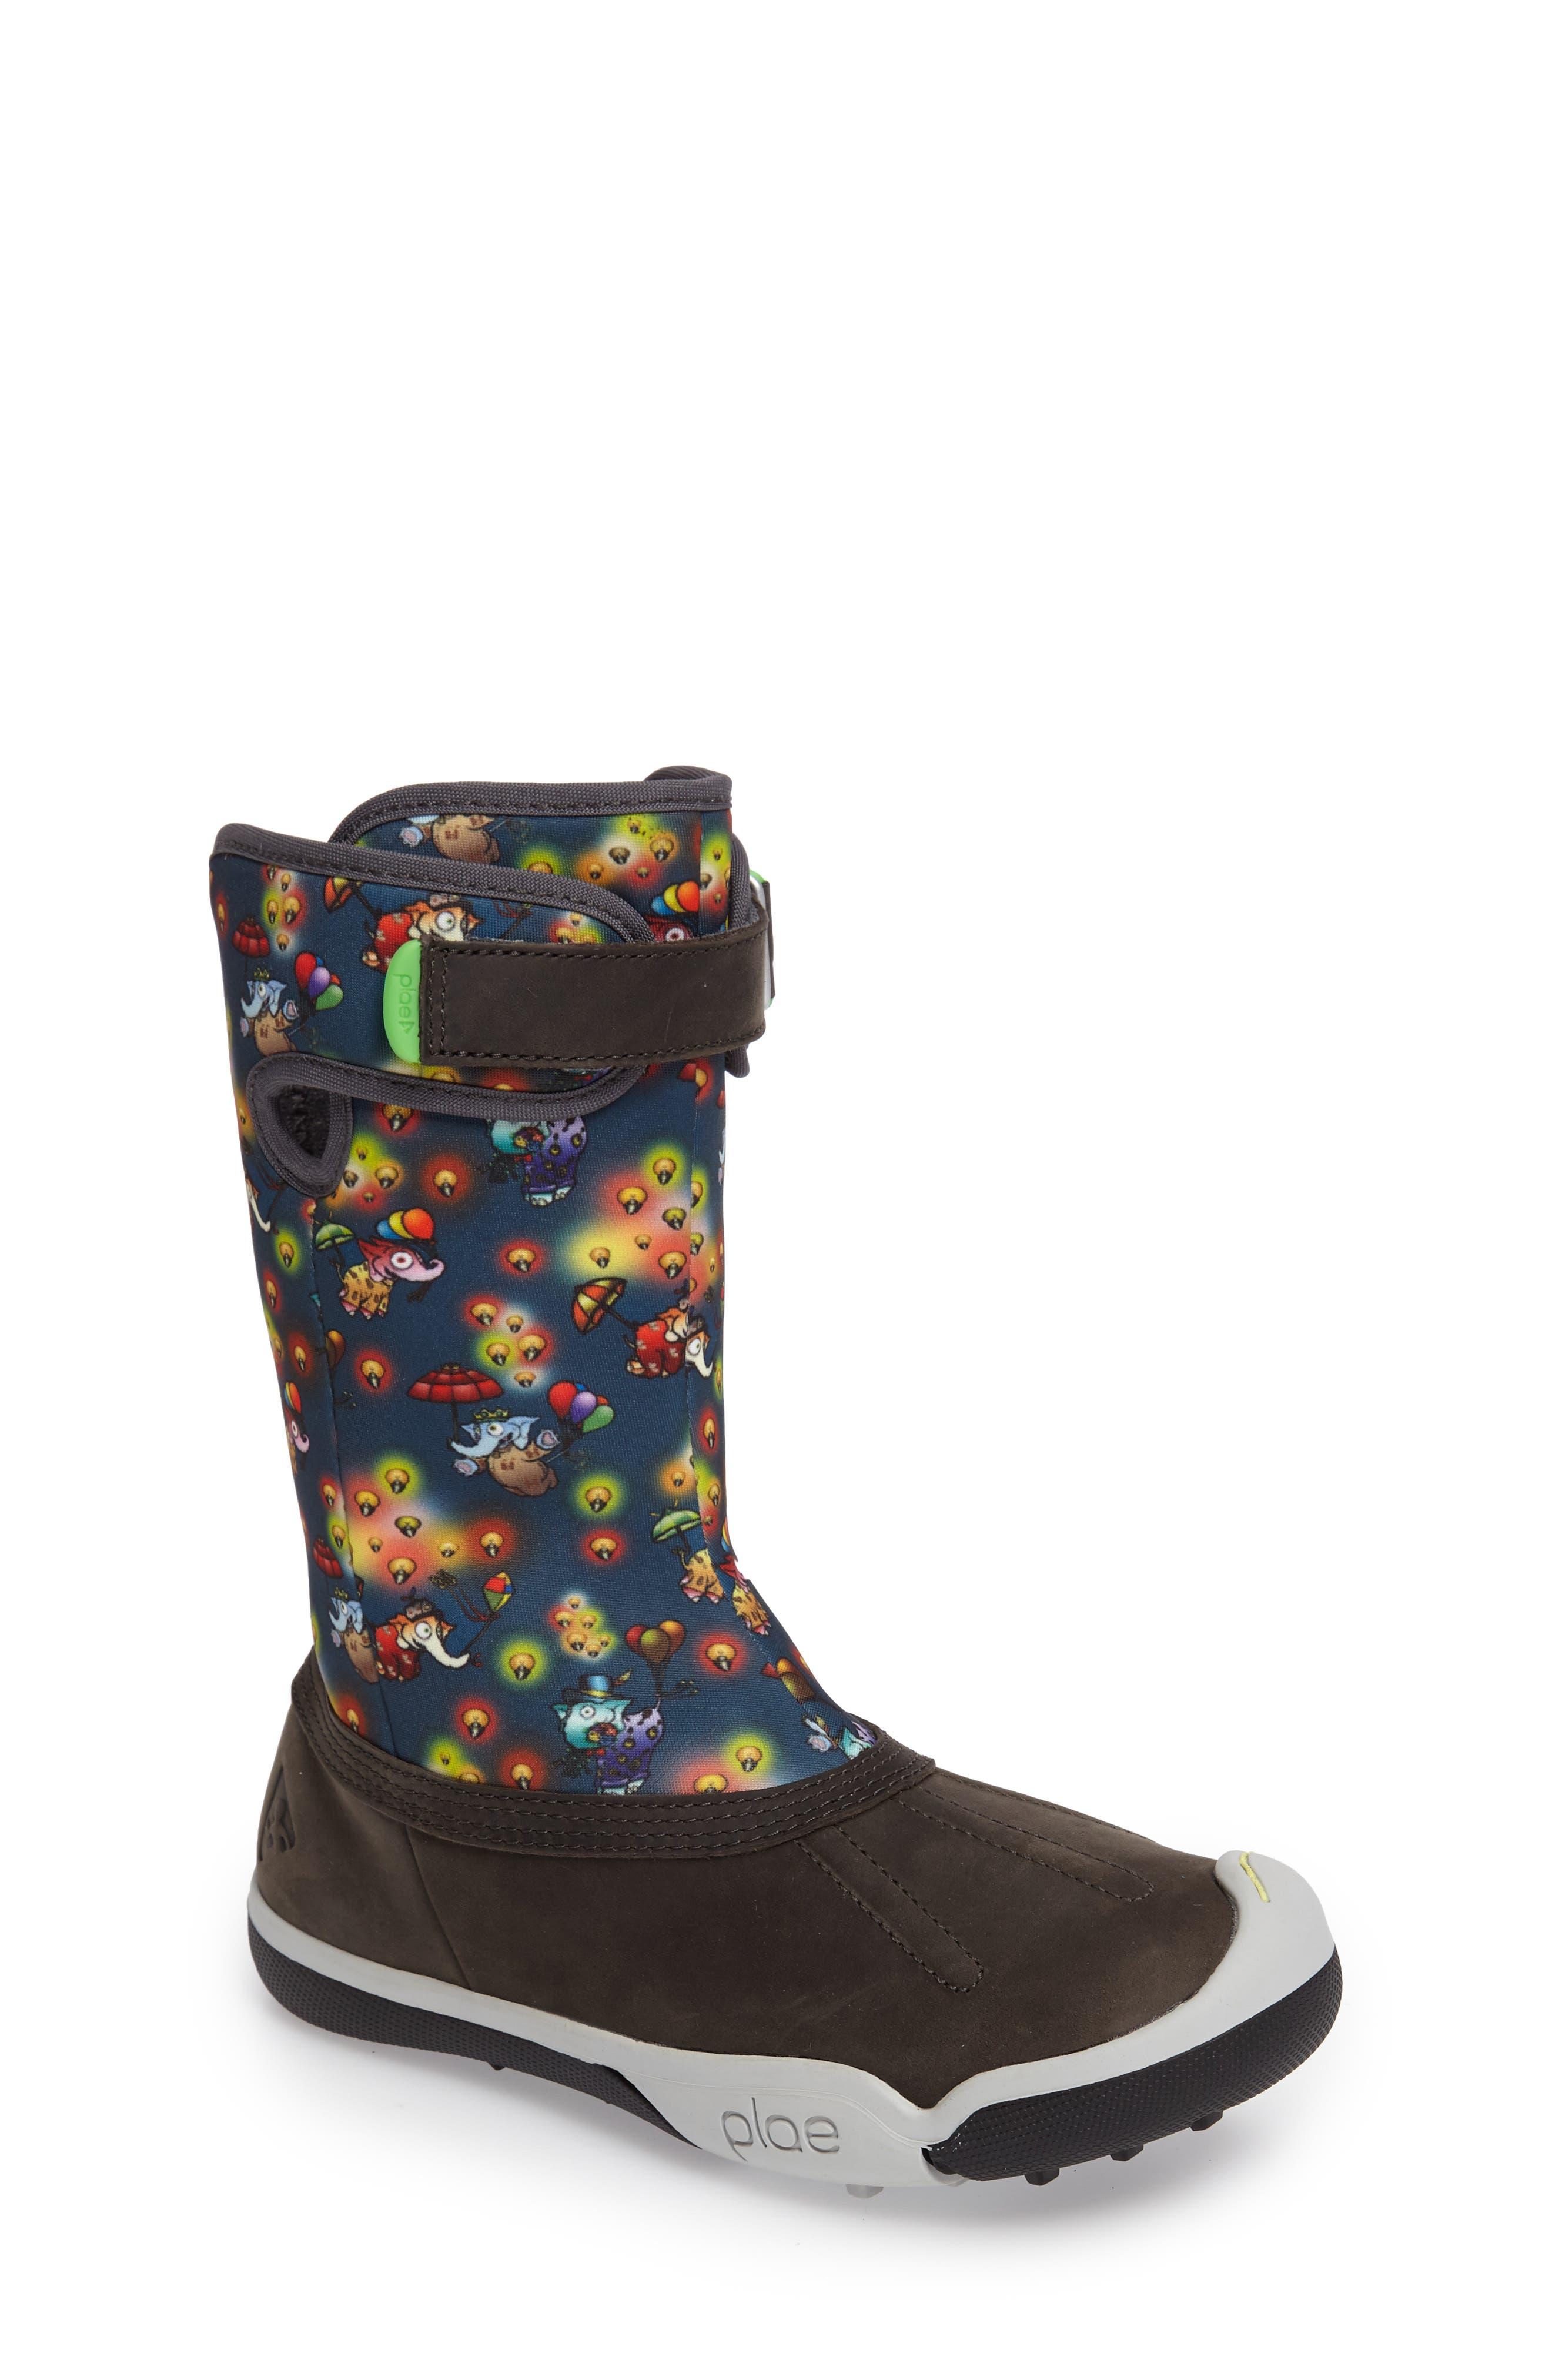 PLAE Thandi Customizable Rain Boot